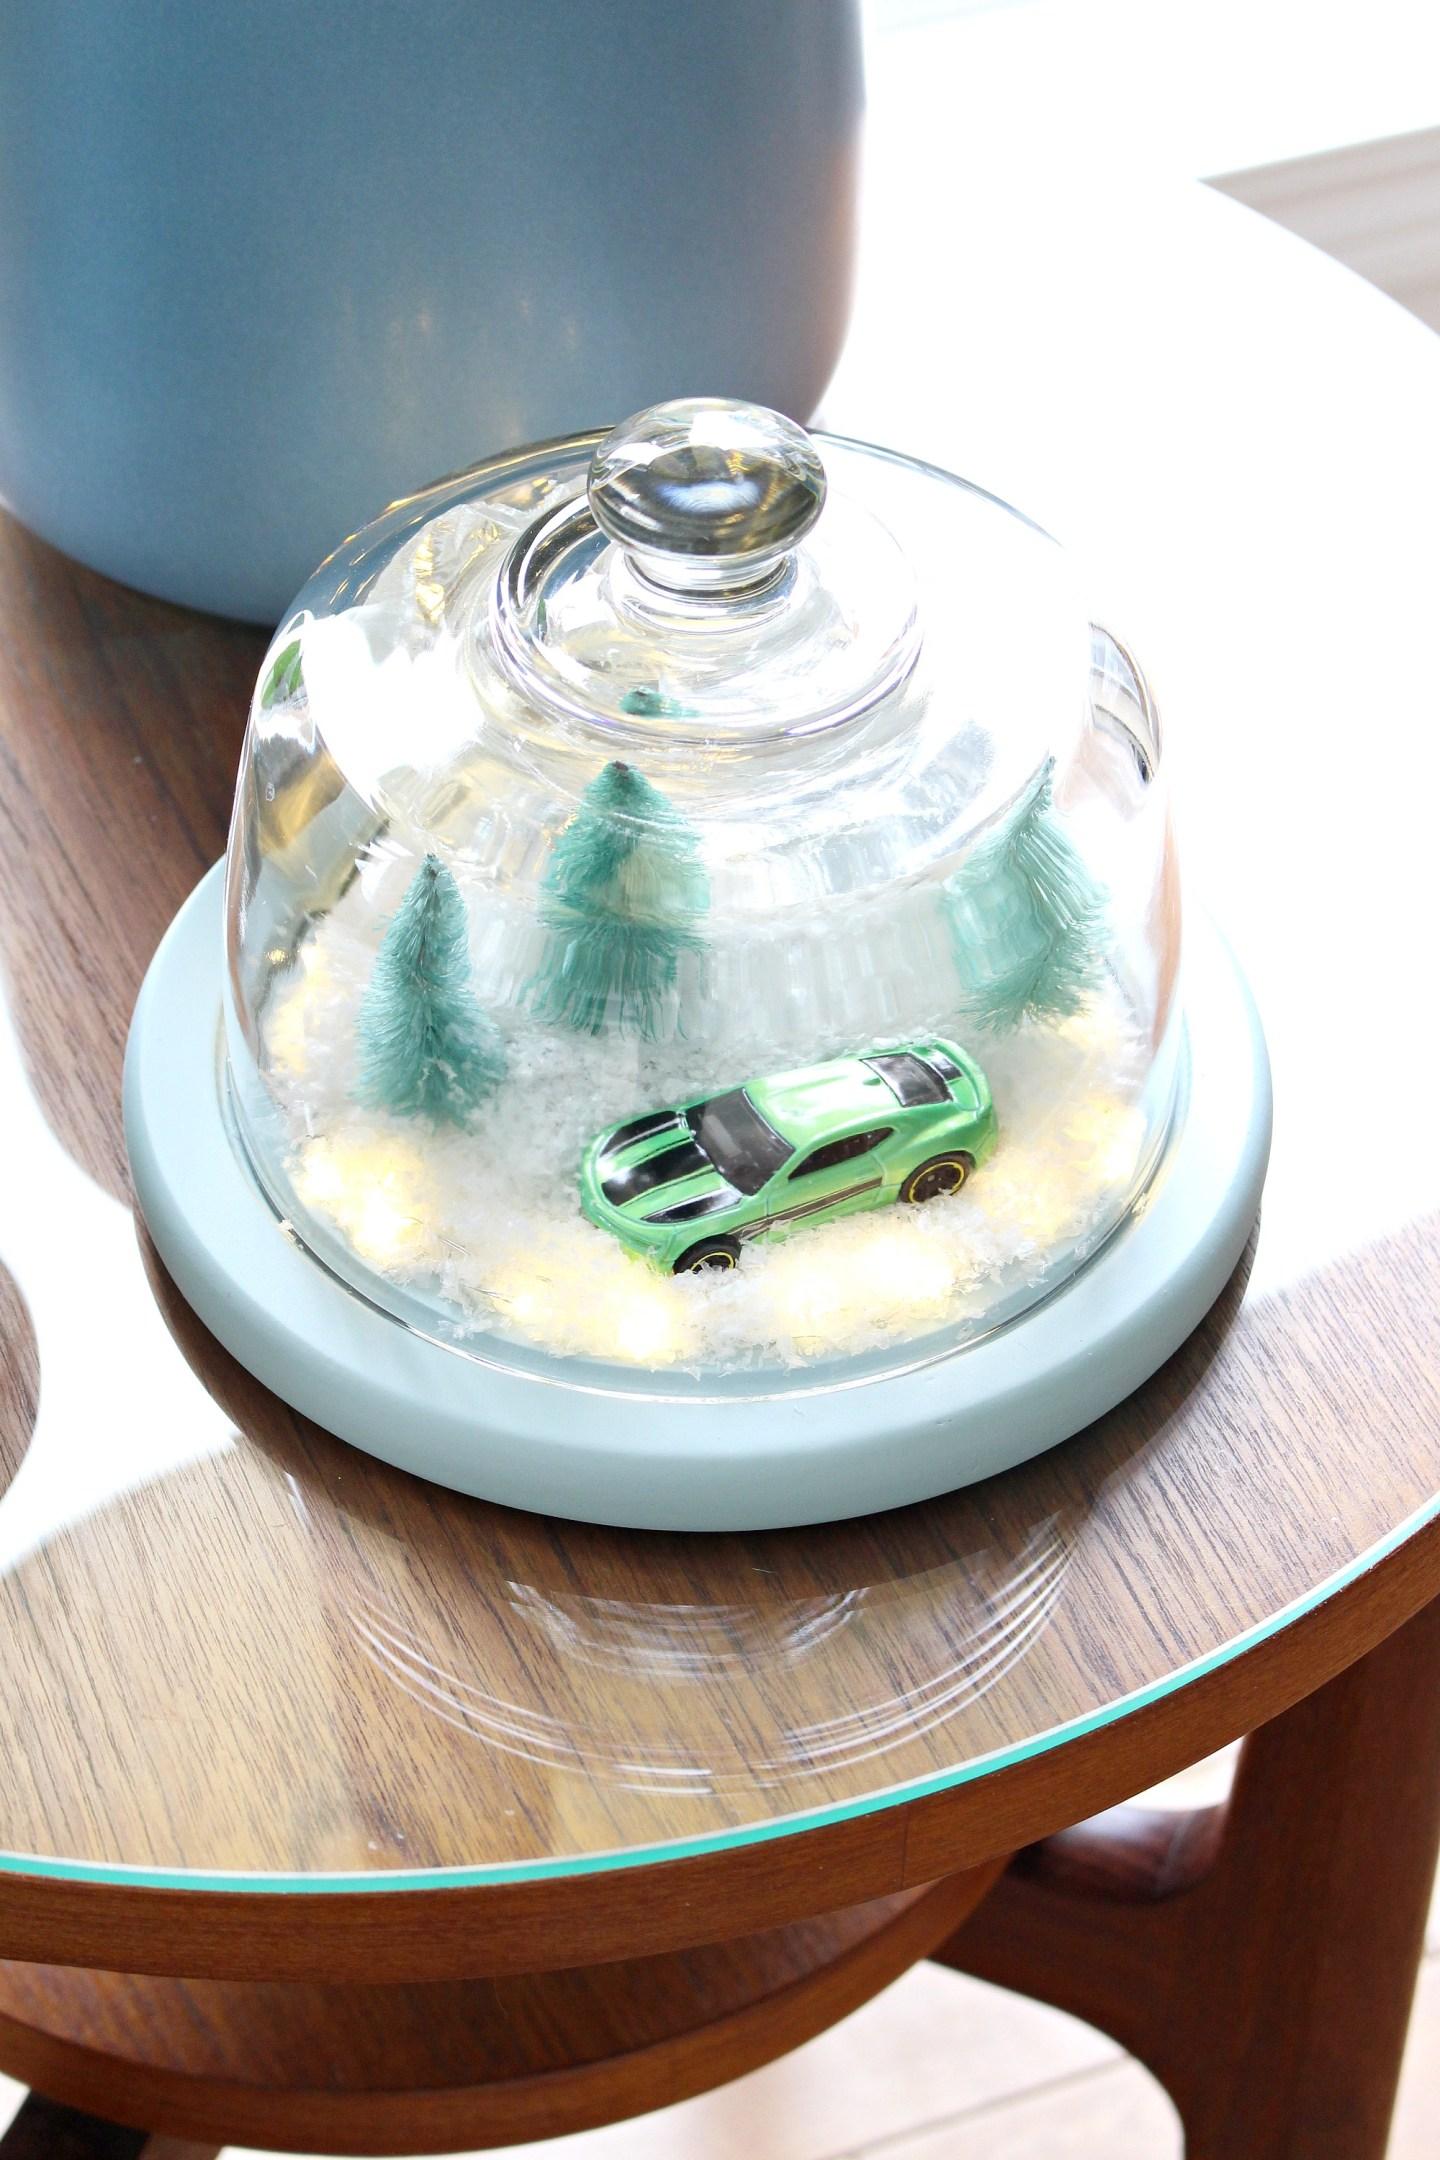 DIY Winter Diorama | aka The Camaro Cloche. Make this easy winter decor using a thrifted cheese cloche. A very Camaro christmas haha! #diy #holidaydecor